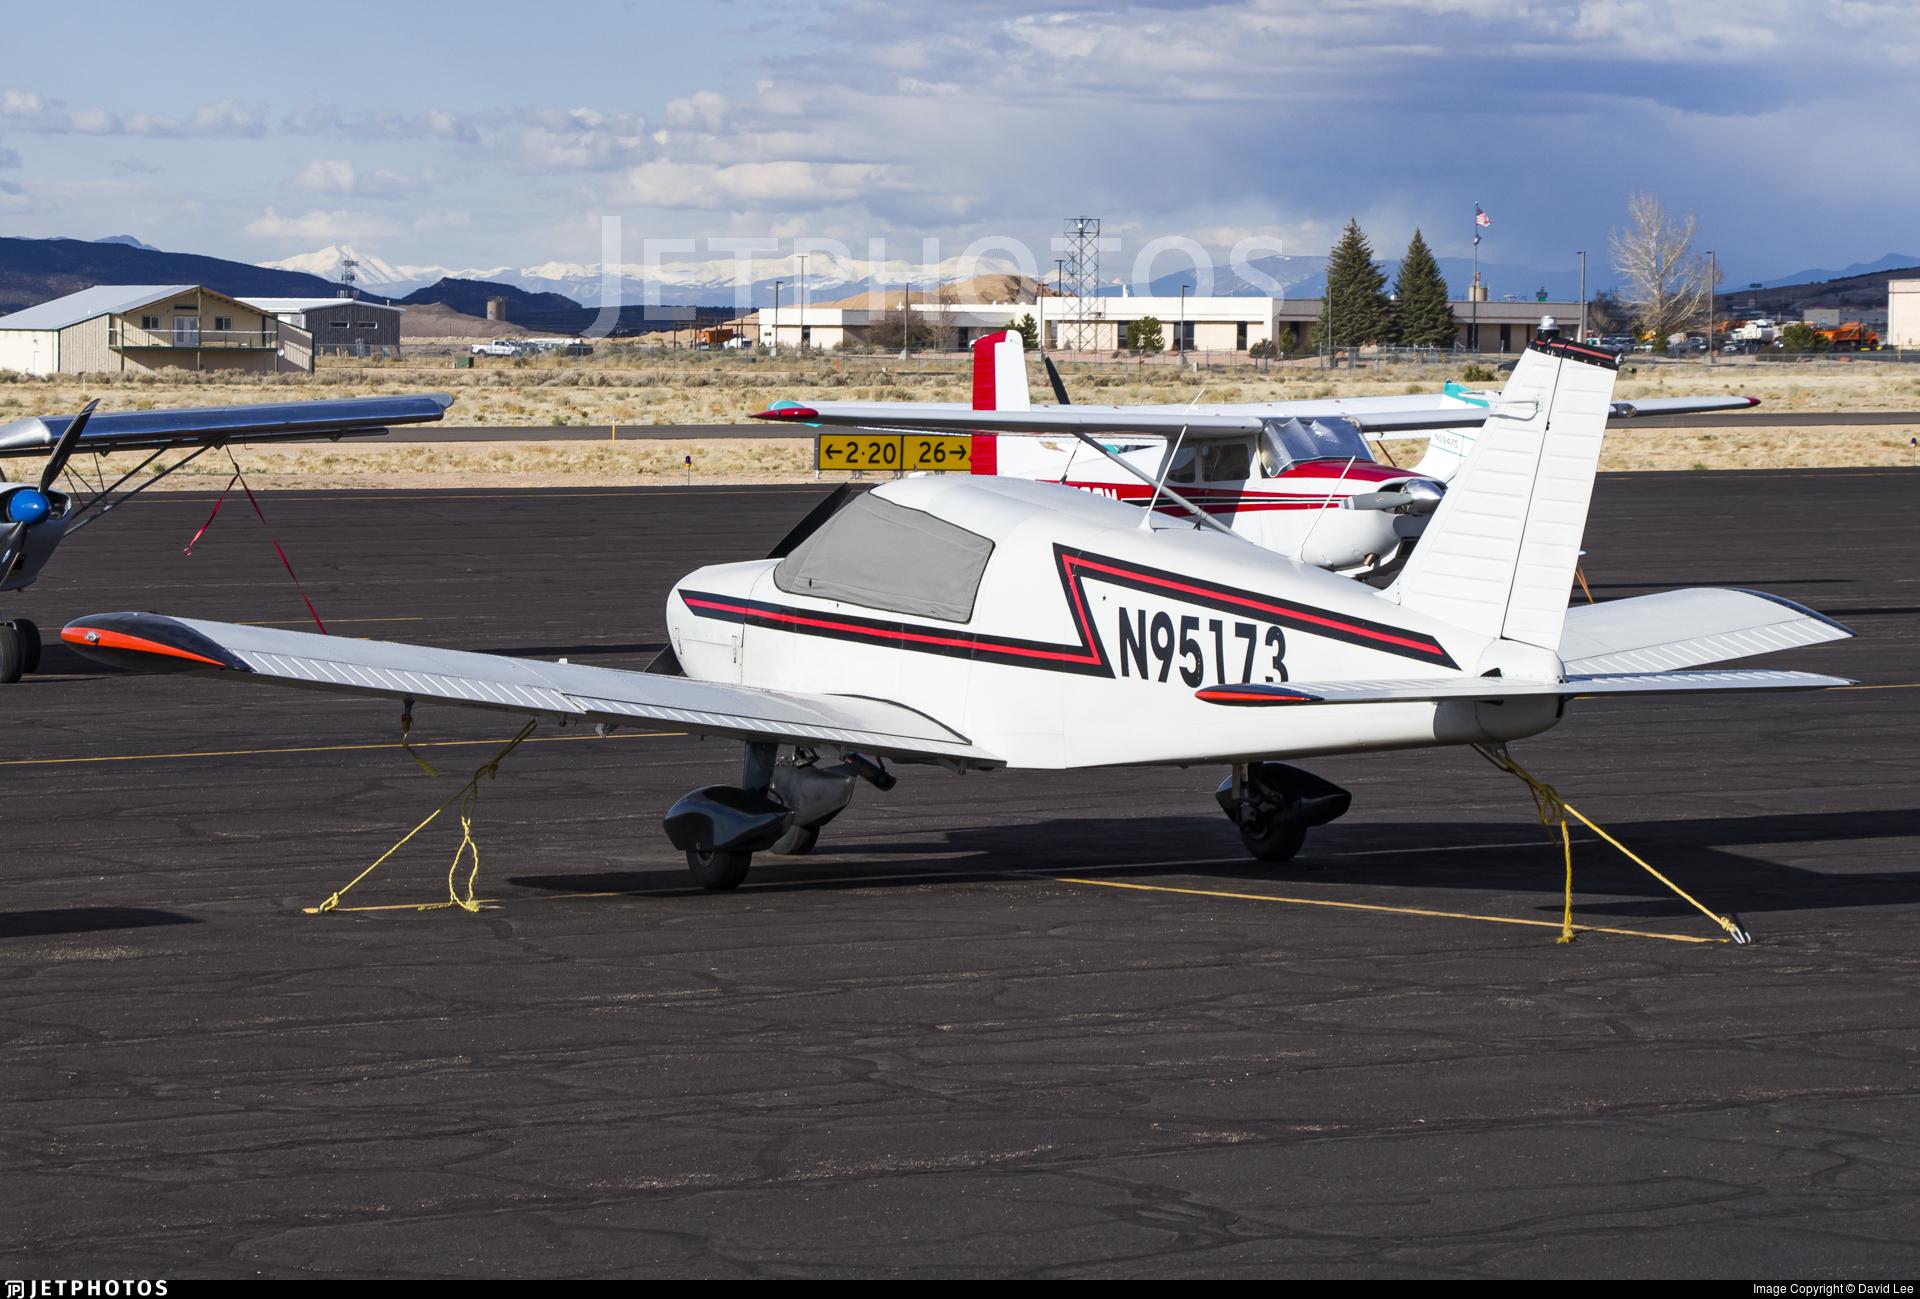 N95173 - Piper PA-28-140 Cherokee - Private